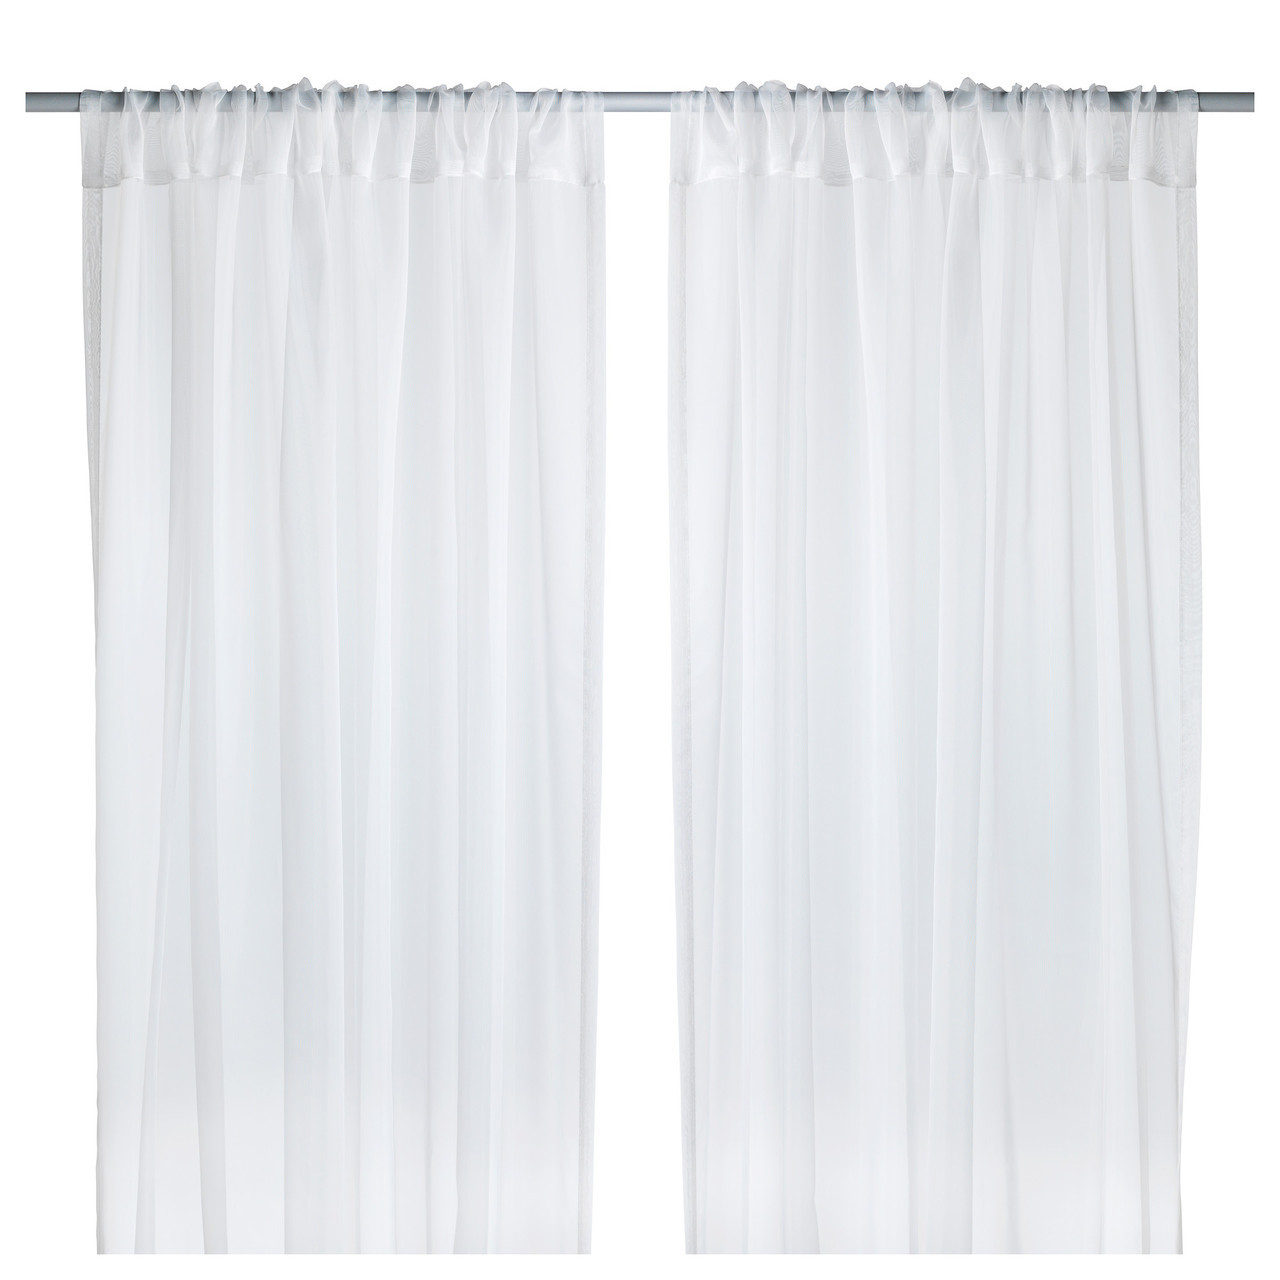 ТЕРЕСИА Гардины, 2 шт., белый, 145x300 см 50232333 ИКЕА, IKEA, TERESIA